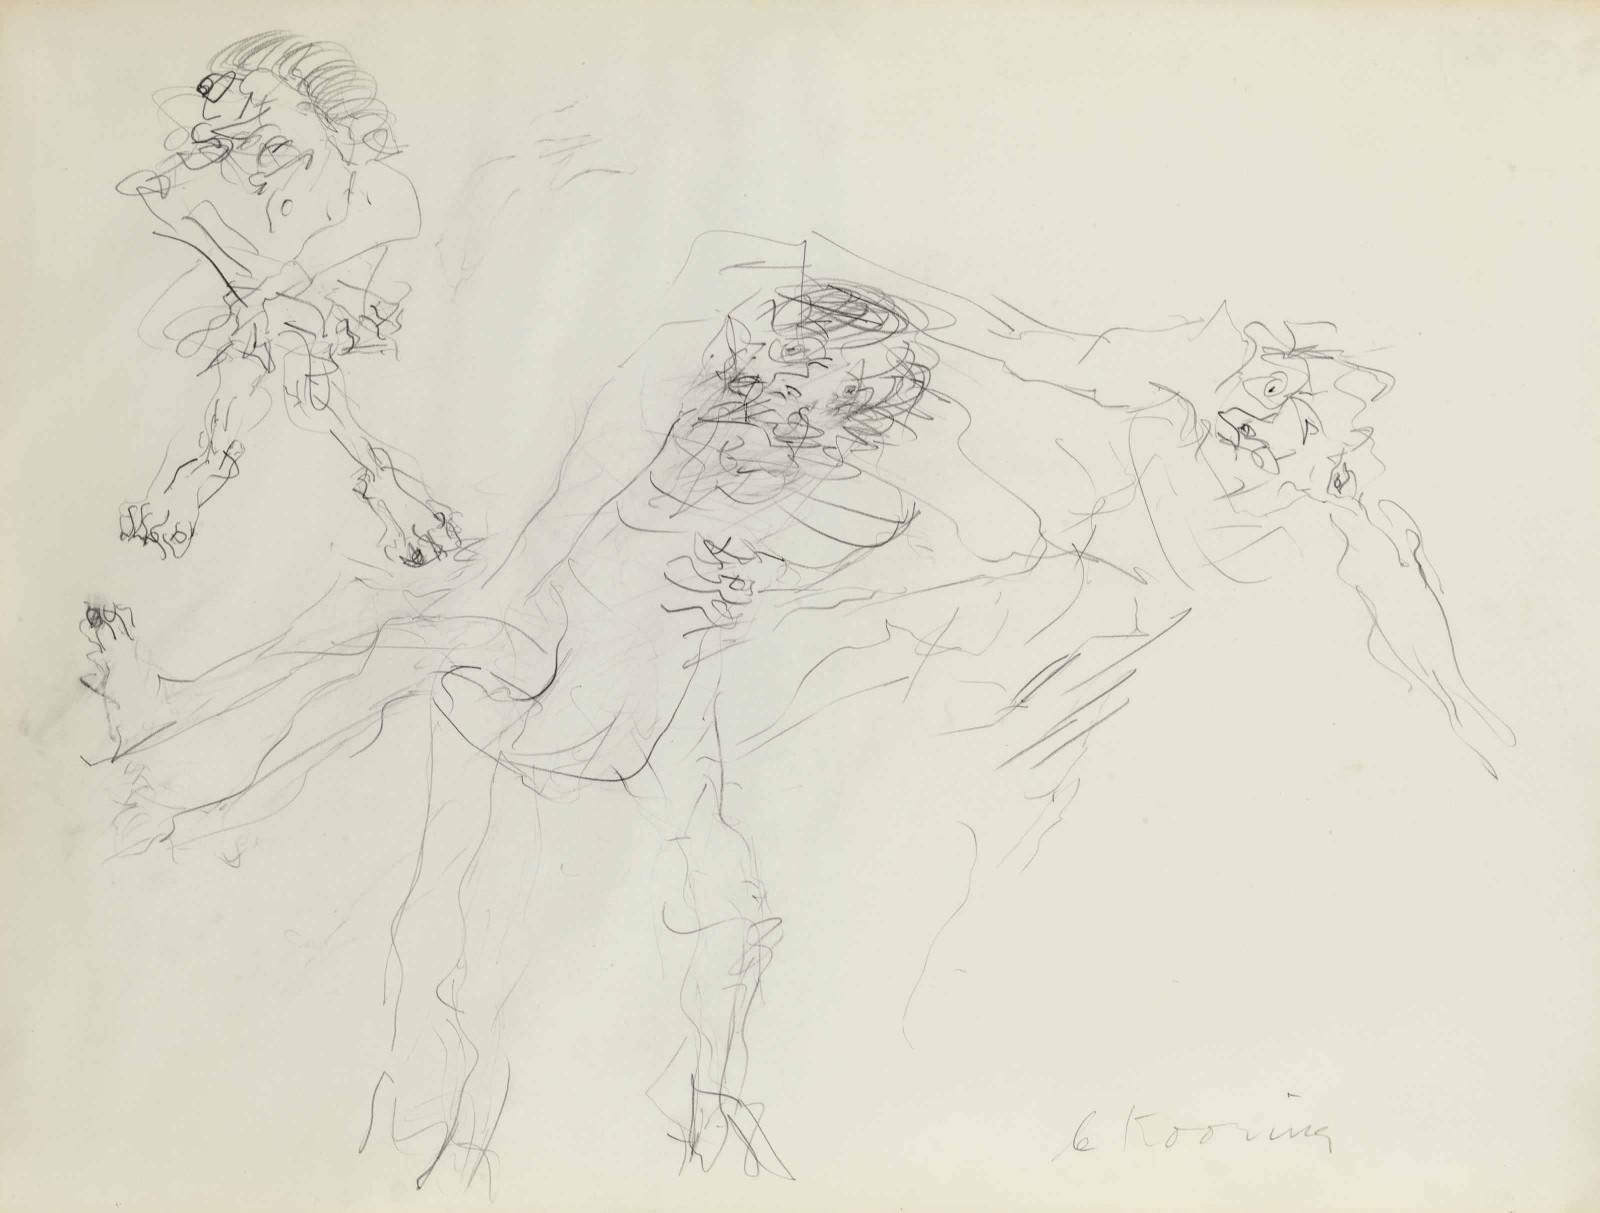 Willem de Kooning-Untitled (Three Figures Drawing)-1969